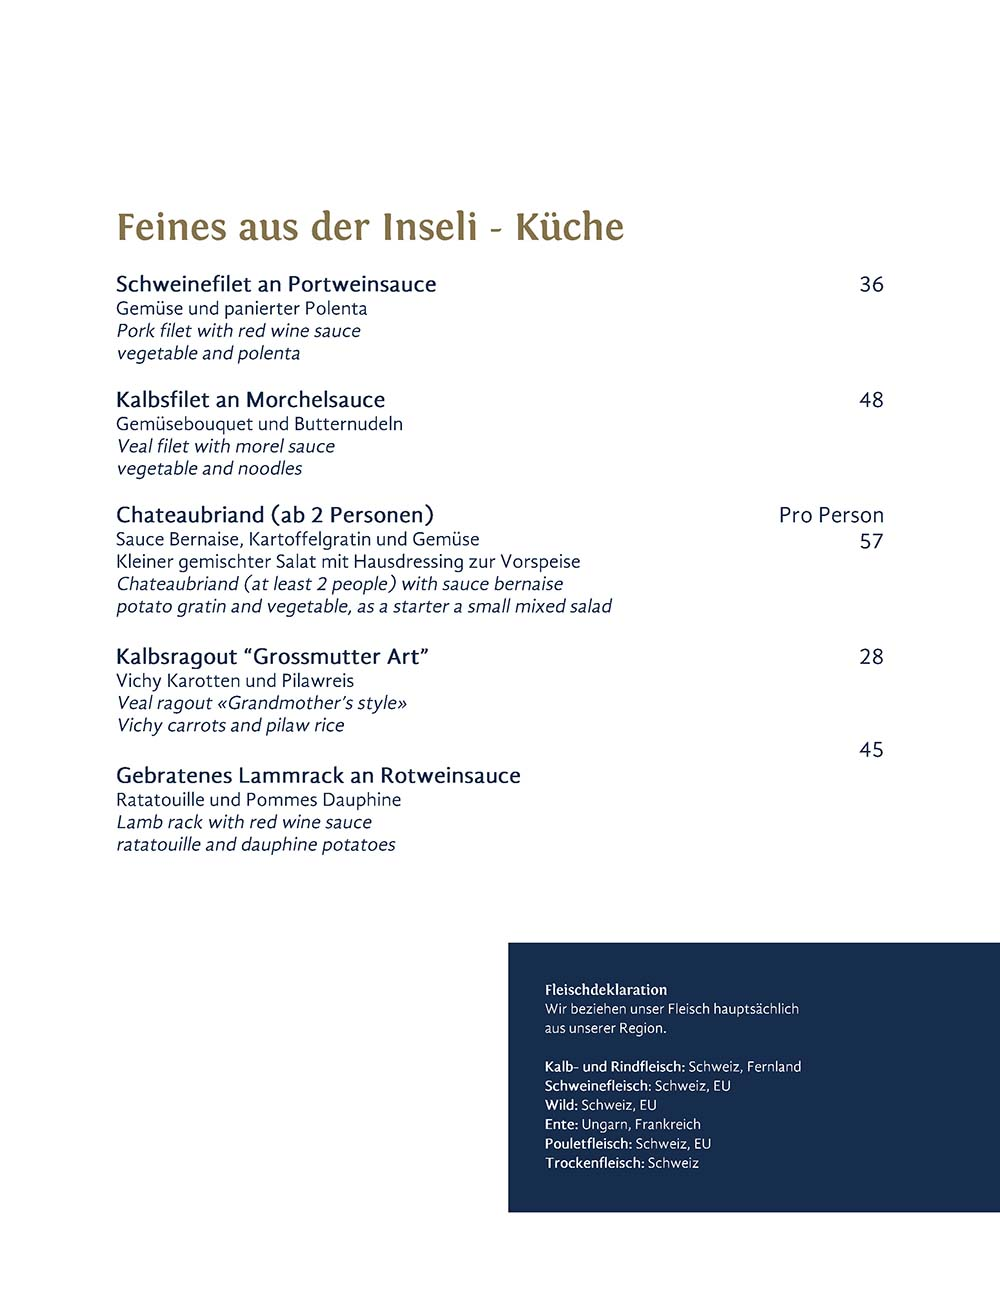 NEUES FORMAT_Speisekarte November 2019_Inseli-3